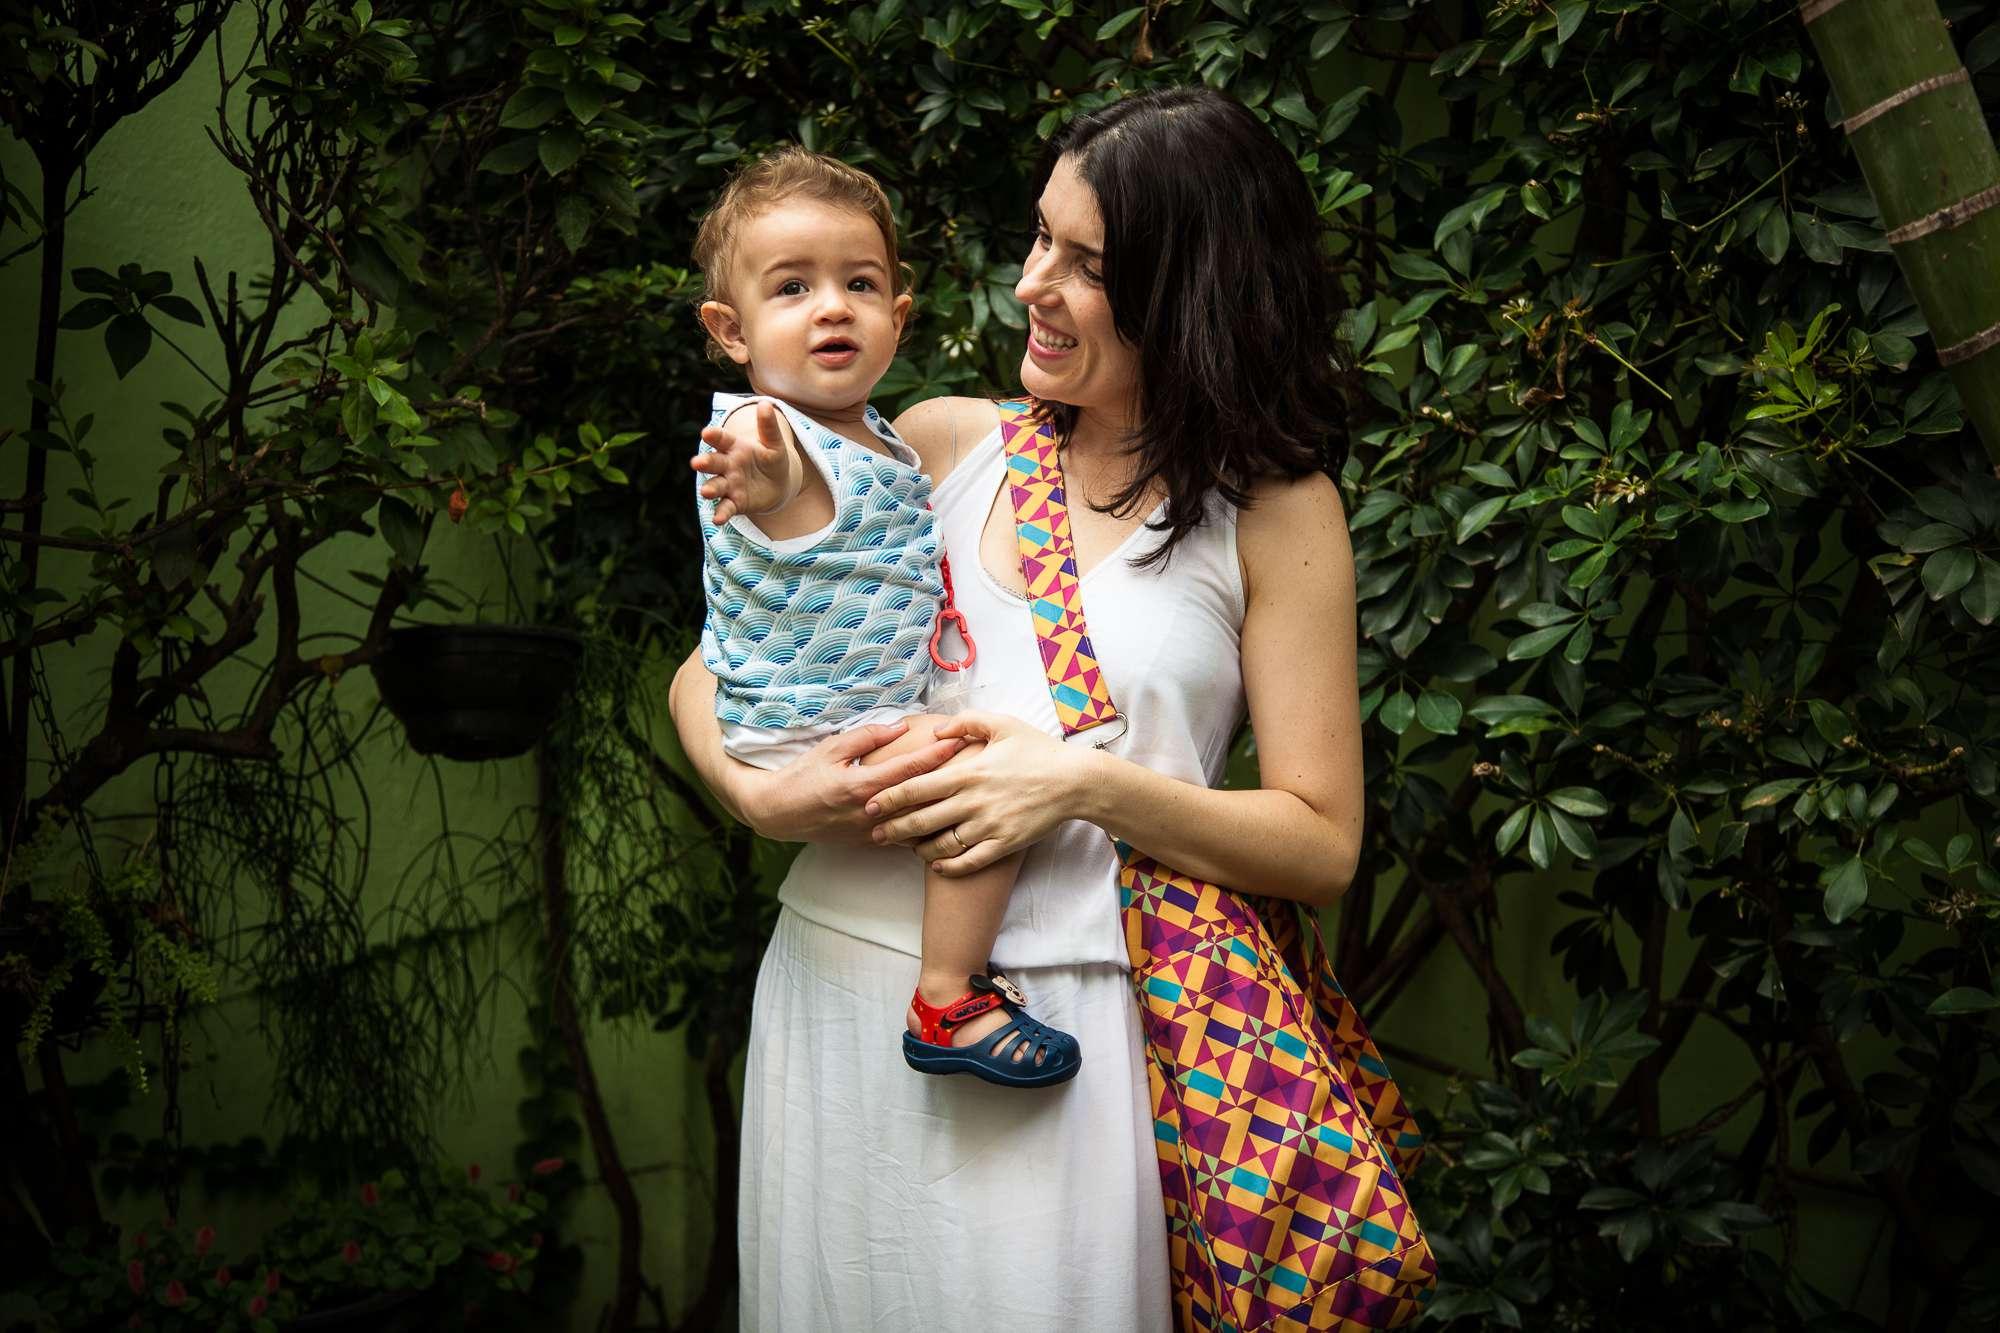 Bolsa para bebê - Sacola Bebêchila Catavento  - estampa by Renata Sader